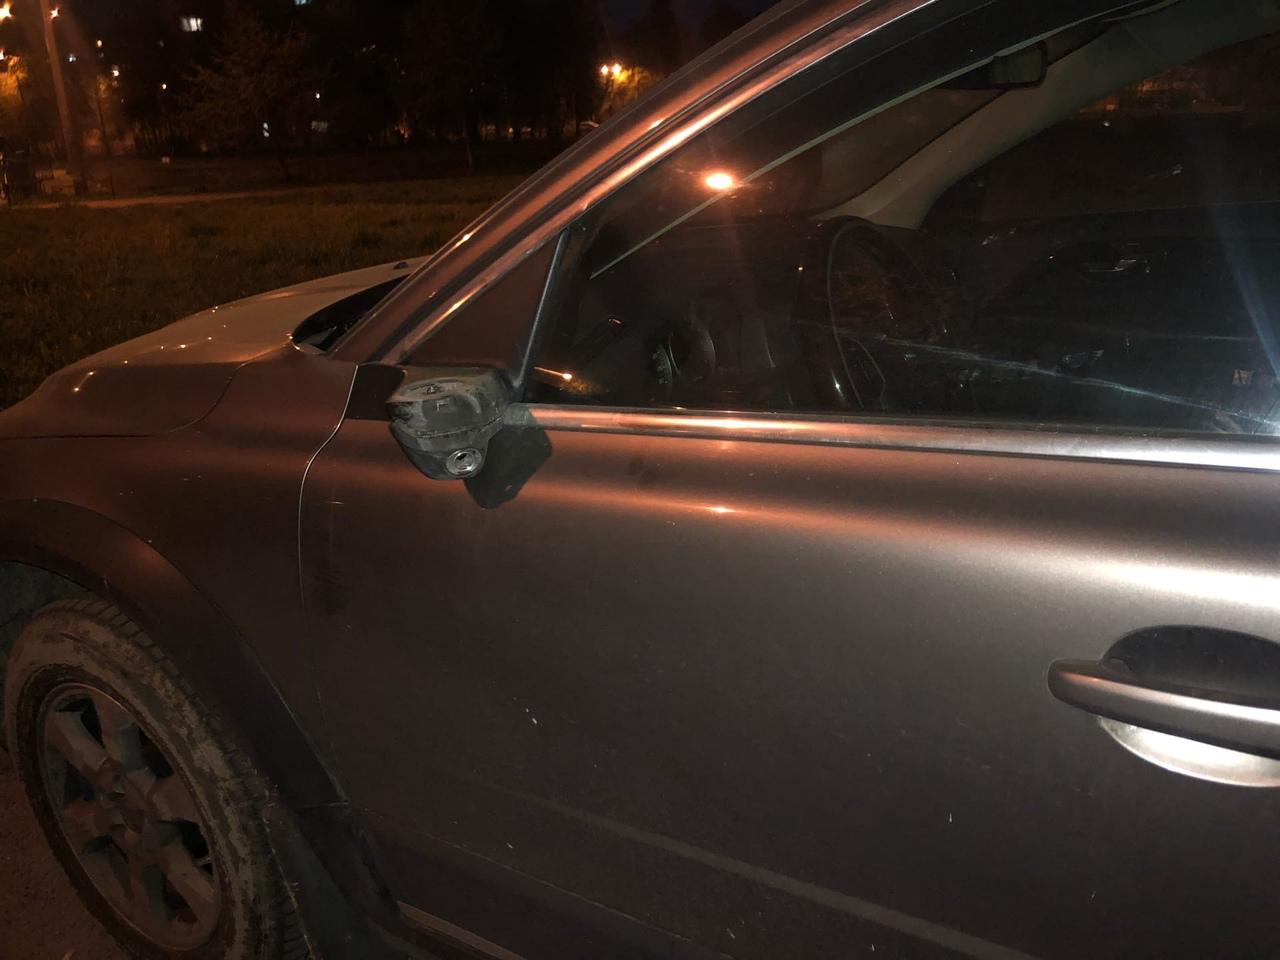 Сегодня (13 мая) срезали зеркала на Volvo XC 70 во дворе между домами 7 и 5 по улице танкиста Хрусти...